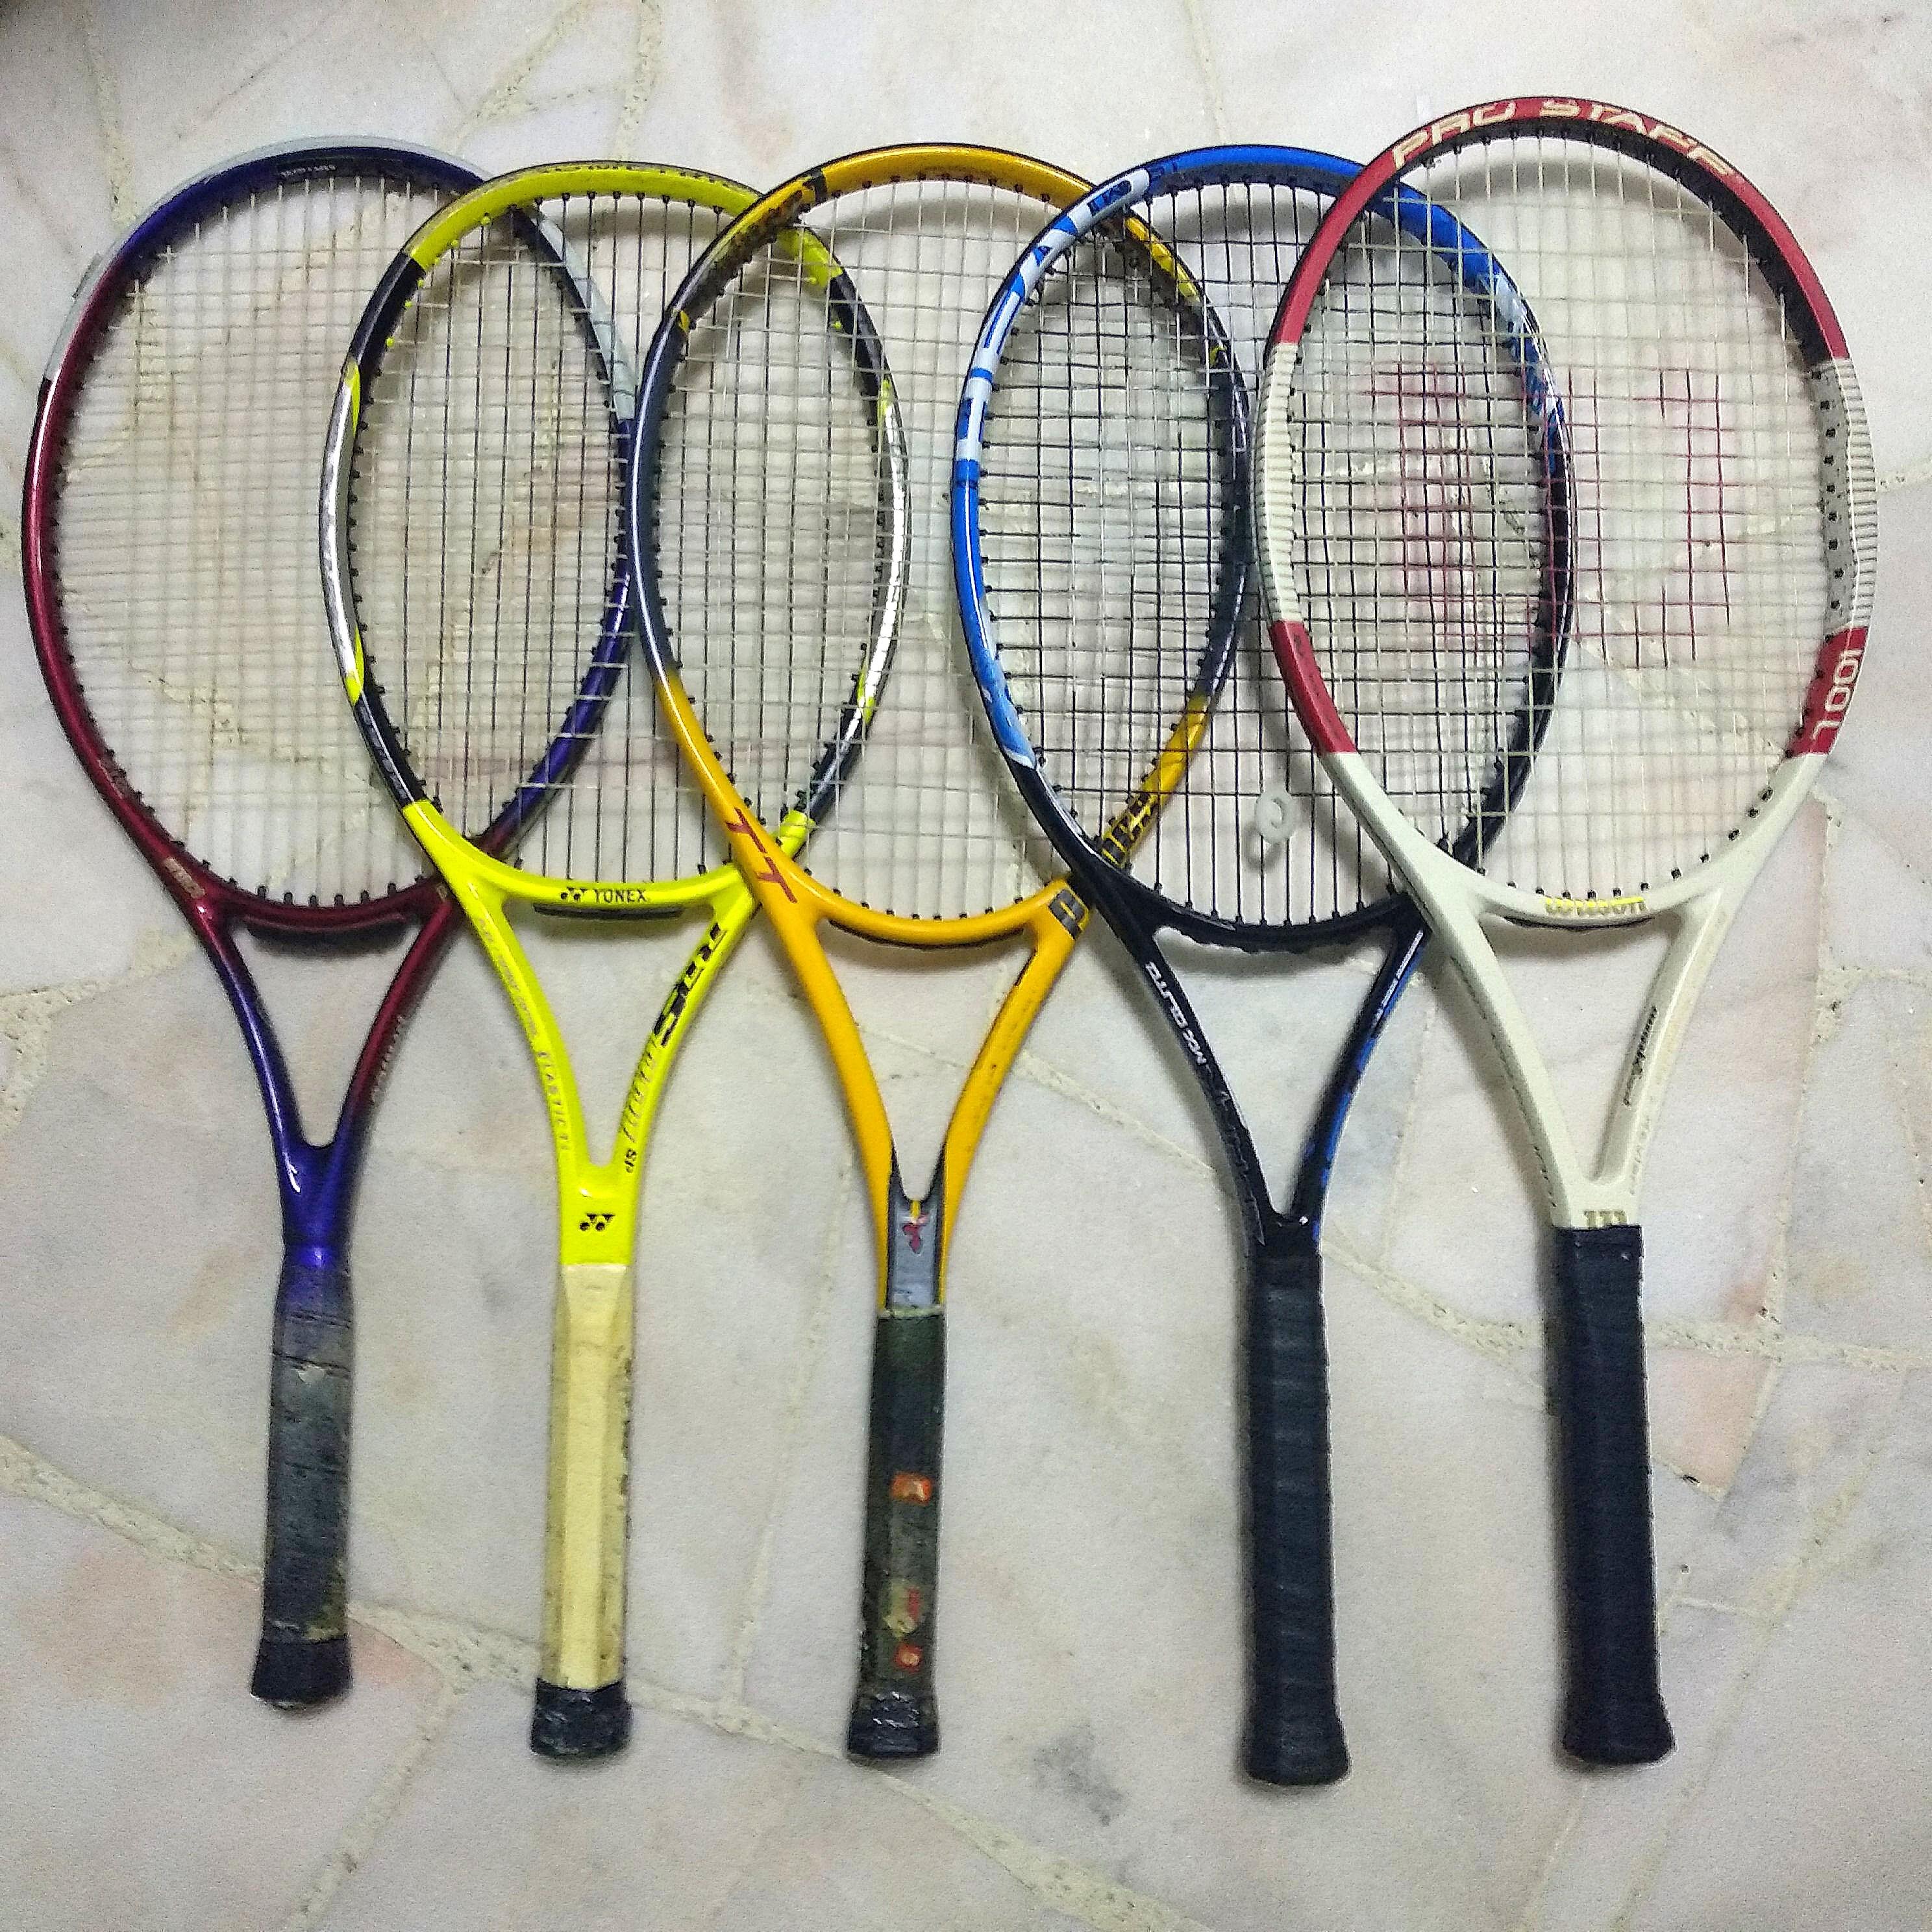 Tennis Racquet Sale >> 50 Tennis Rackets Cny Sale